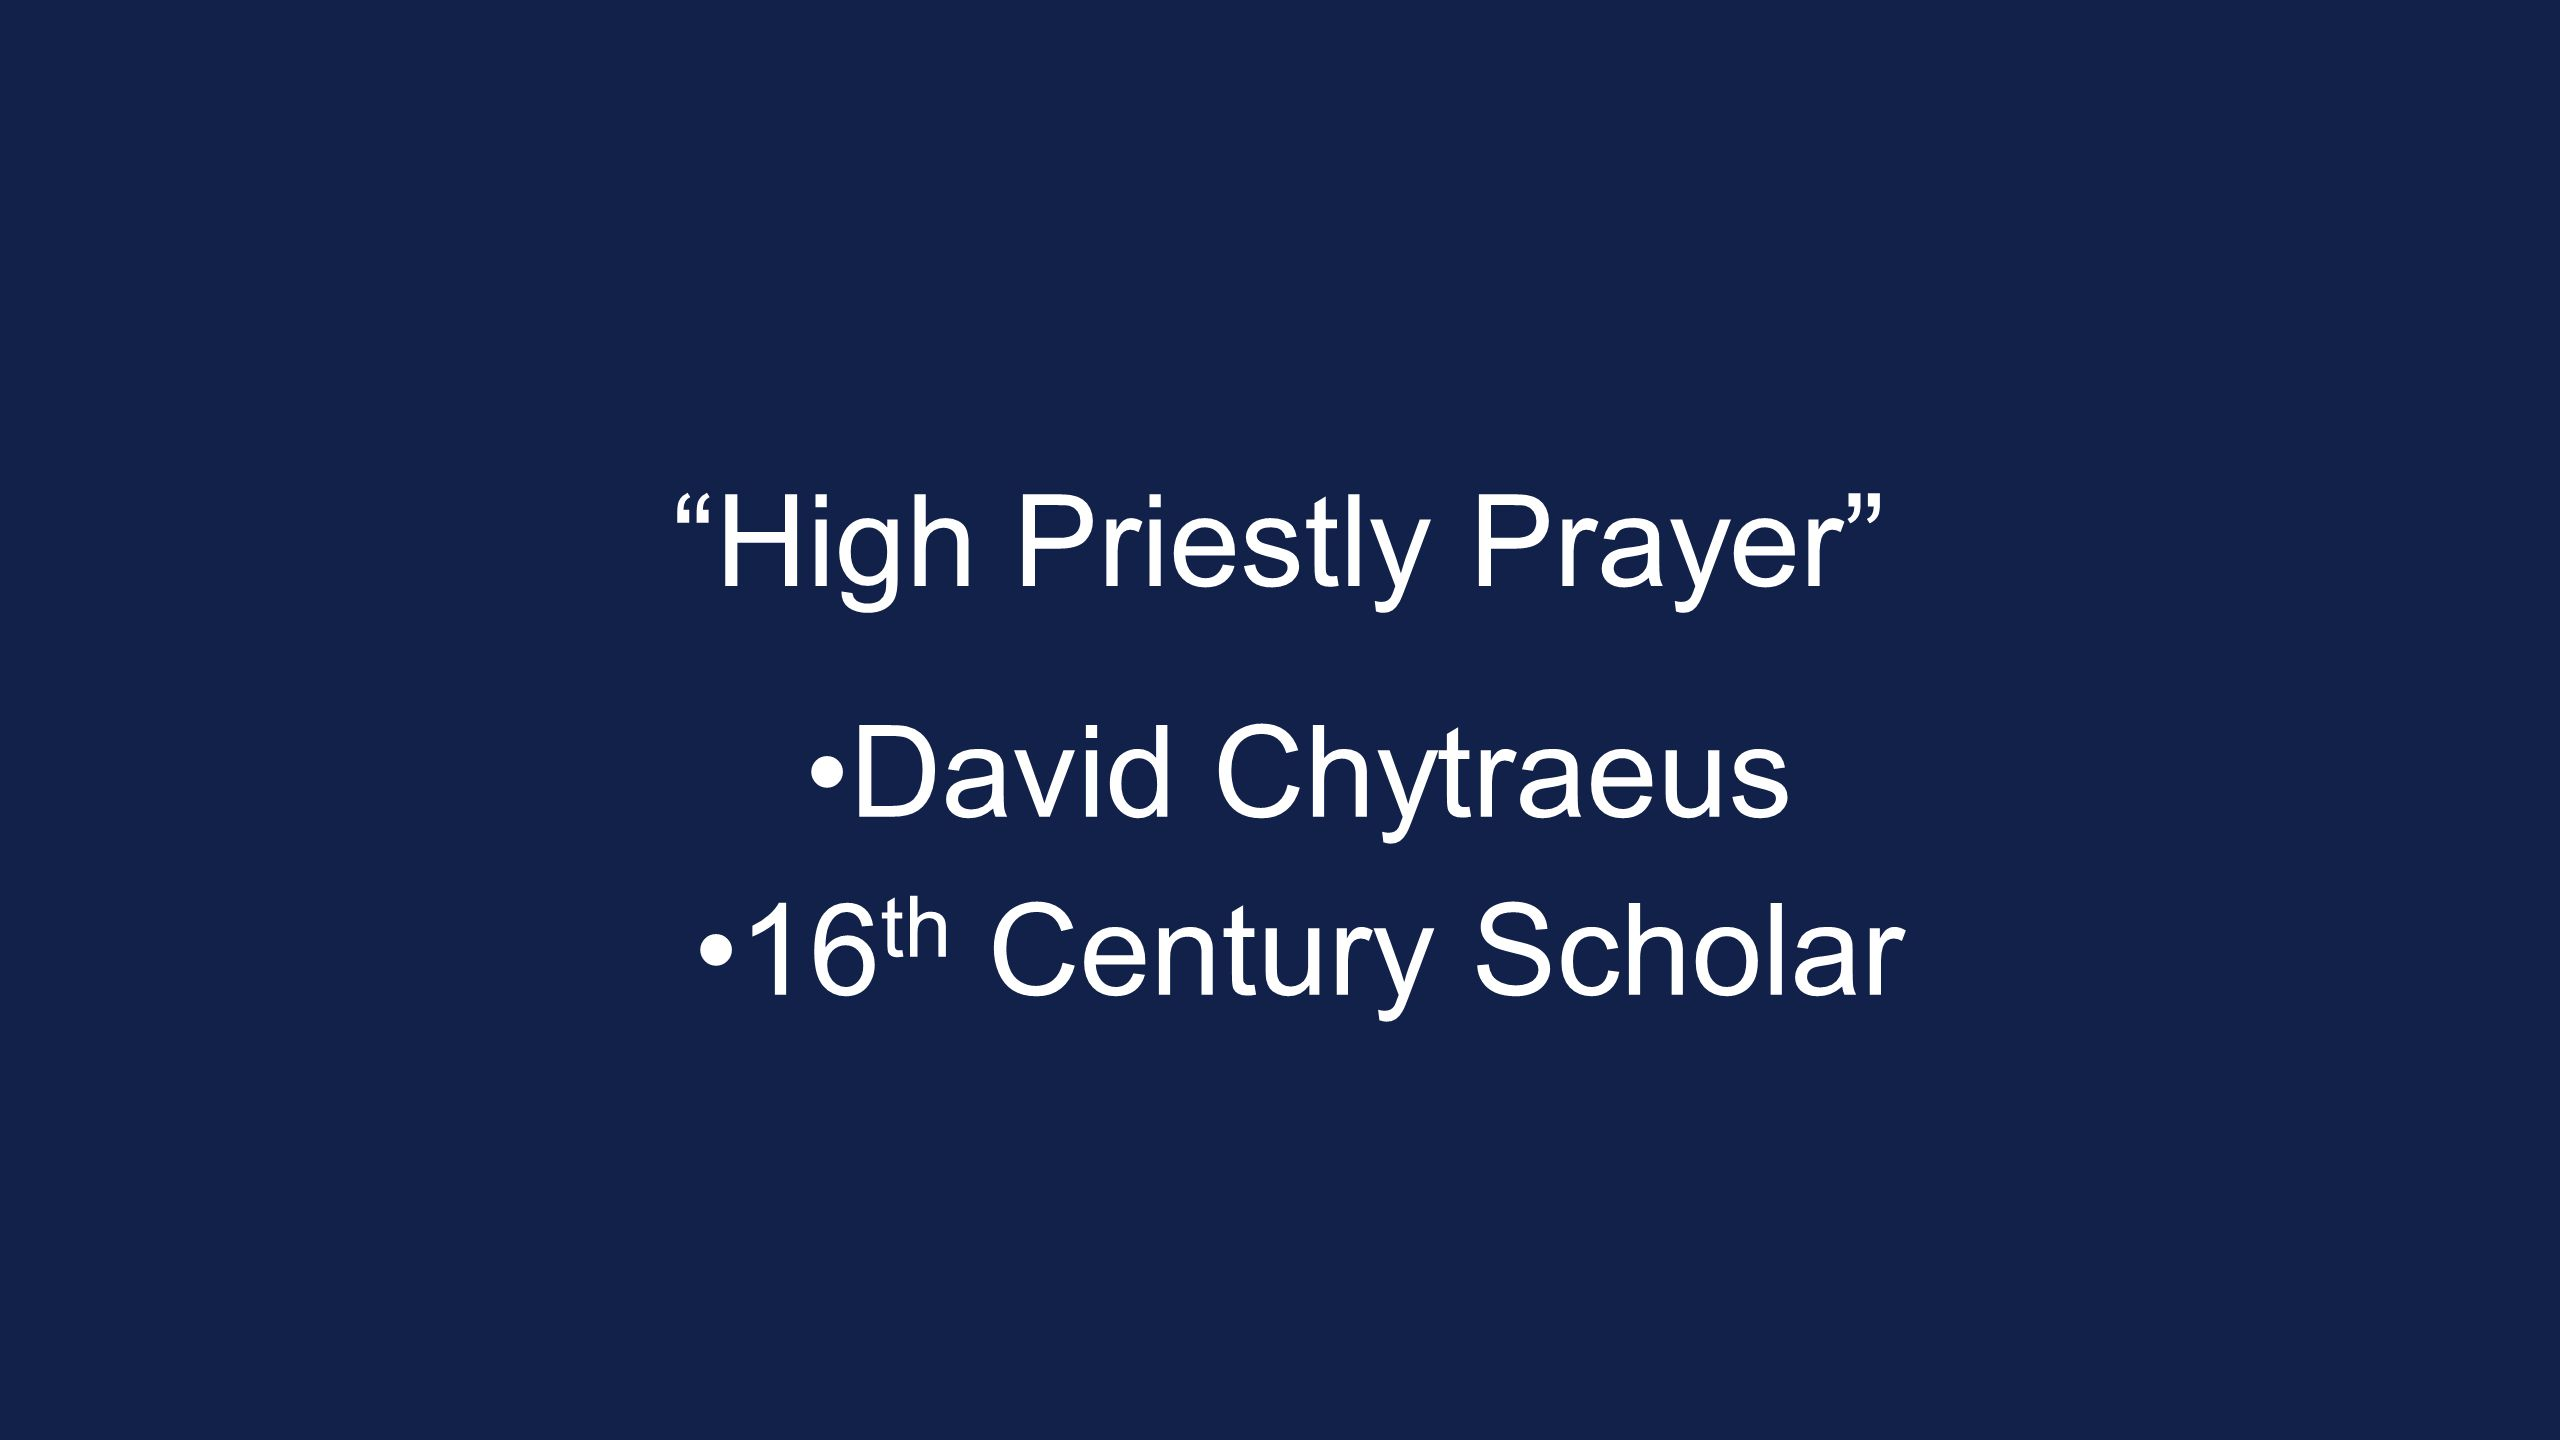 High Priestly Prayer